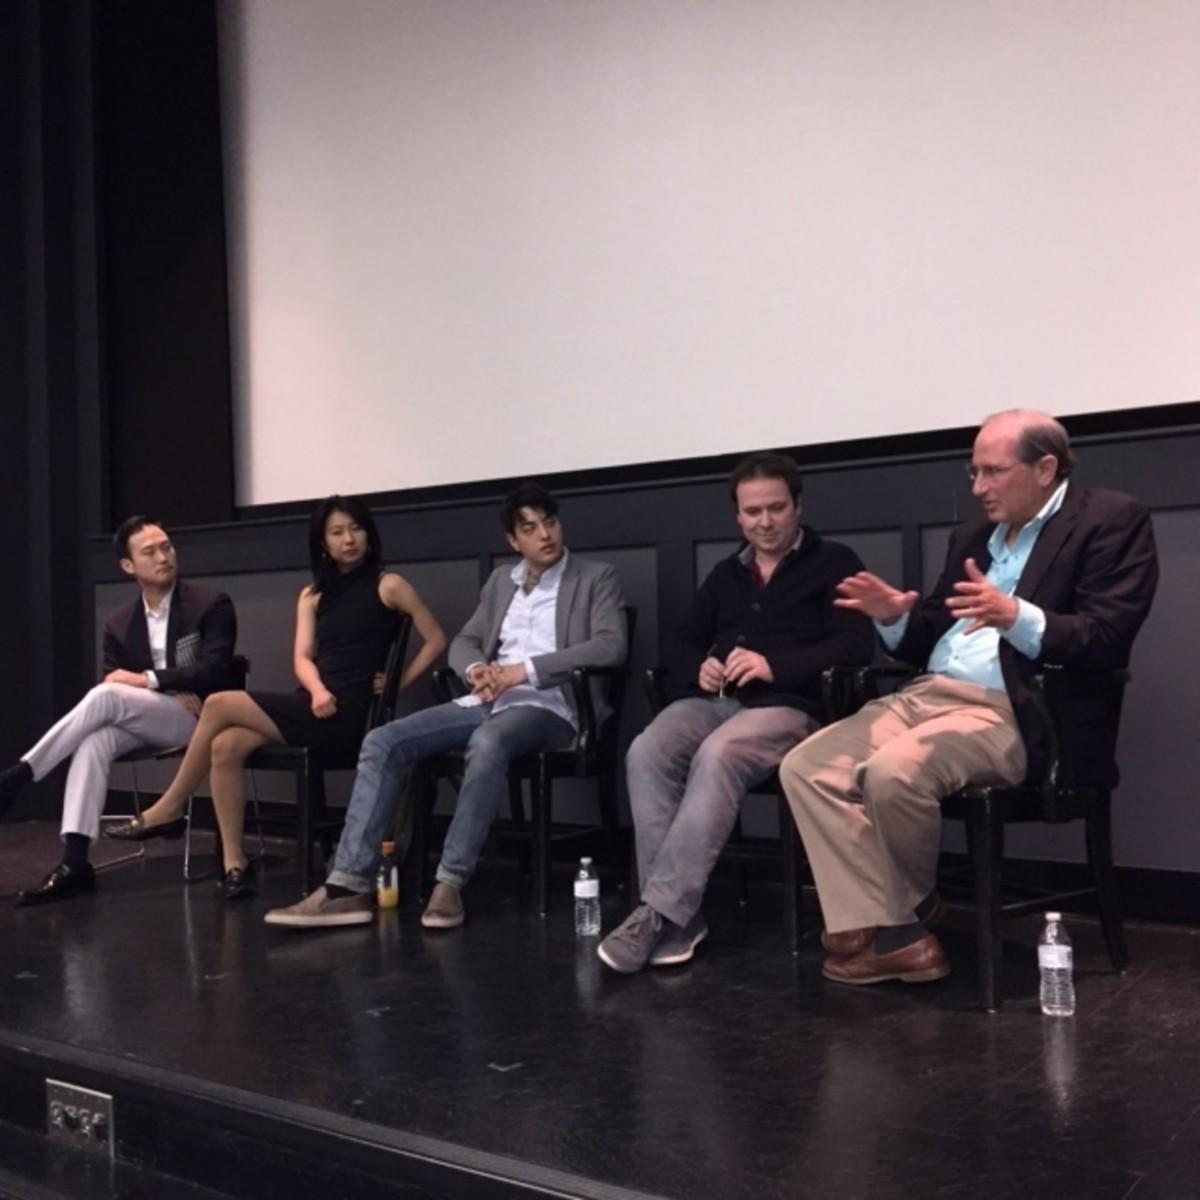 Panelists: Albert Choi, Yuka Taga, Daniel Klimek, Declan Loftus, Dick Atkins (L to R)